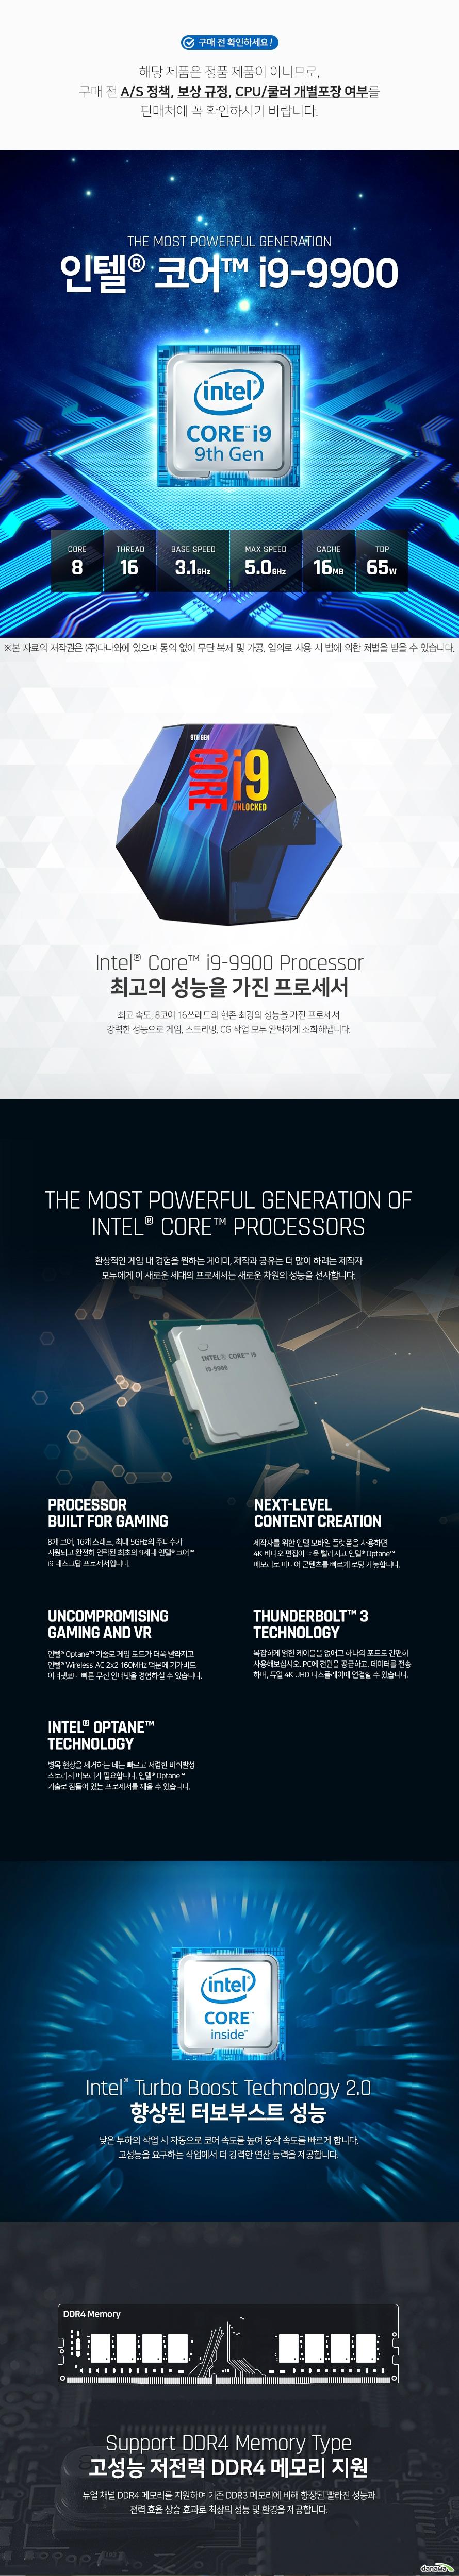 해당 제품은 정품 제품이 아니므로, 구매 전 A/S 정책, 보상 규정, CPU/쿨러 개별포장 여부를 판매처에 꼭 확인하시기 바랍니다.    인텔 코어 i9-9900  최고의 성능을 가진 프로세서 최고 5Ghz의 속도, 8코어 16쓰레드의 현존 최강의 성능을 가진 프로세서 강력한 성능으로 게임, 스트리밍, CG 작업 모두 완벽하게 소화해냅니다.  환상적인 게임 내 경험을 원하는 게이머, 제작과 공유는 더 많이 하려는 제작자  모두에게 이 새로운 세대의 프로세서는 새로운 차원의 성능을 선사합니다.  8개 코어, 16개 스레드, 최대 5GHz의 주파수가  지원되고 완전히 언락된 최초의 9세대 인텔 코어  i9 데스크탑 프로세서입니다.  제작자를 위한 인텔 모바일 플랫폼을 사용하면  4K 비디오 편집이 더욱 빨라지고 인텔 Optane 메모리로 미디어 콘텐츠를 빠르게 로딩 가능합니다.  인텔 Optane 기술로 게임 로드가 더욱 빨라지고  인텔 Wireless-AC 2x2 160MHz 덕분에 기가비트  이더넷보다 빠른 무선 인터넷을 경험하실 수 있습니다.  복잡하게 얽힌 케이블을 없애고 하나의 포트로 간편히  사용해보십시오. PC에 전원을 공급하고, 데이터를 전송 하며, 듀얼 4K UHD 디스플레이에 연결할 수 있습니다.  병목 현상을 제거하는 데는 빠르고 저렴한 비휘발성  스토리지 메모리가 필요합니다. 인텔 Optane  기술로 잠들어 있는 프로세서를 깨울 수 있습니다.   향상된 터보부스트 성능 낮은 부하의 작업 시 자동으로 코어 속도를 높여 동작 속도를 빠르게 합니다. 고성능을 요구하는 작업에서 더 강력한 연산 능력을 제공합니다.  고성능 저전력 DDR4 메모리 지원 듀얼 채널 DDR4 메모리를 지원하여 기존 DDR3 메모리에 비해 향상된 빨라진 성능과 전력 효율 상승 효과로 최상의 성능 및 환경을 제공합니다.  인텔 퀵 싱크 비디오 인텔 퀵 싱크 비디오로 휴대용 미디어 플레이어용 비디오 변환을 신속하게  할 수 있으며, 온라인 공유, 편집 및 비디오 제작이 가능합니다.  인텔 하이퍼 스레딩 기술 물리적 코어당 2개의 처리 스레드를 제공합니다. 스레드 수가 많은 응용 프로그램 일수록 동시에 더 많은 작업을 수행할 수 있기 때문에 작업 완료 속도가 더 빨라집니다.  인텔 UHD 그래픽스 630 내장 그래픽 성능을 대폭 늘려 4K 초고해상도 영상을 60프레임으로 부드럽게 재생하며 선명한 화질과 화사한 색감으로 퀄리티 있는 디스플레이 환경을 제공합니다.